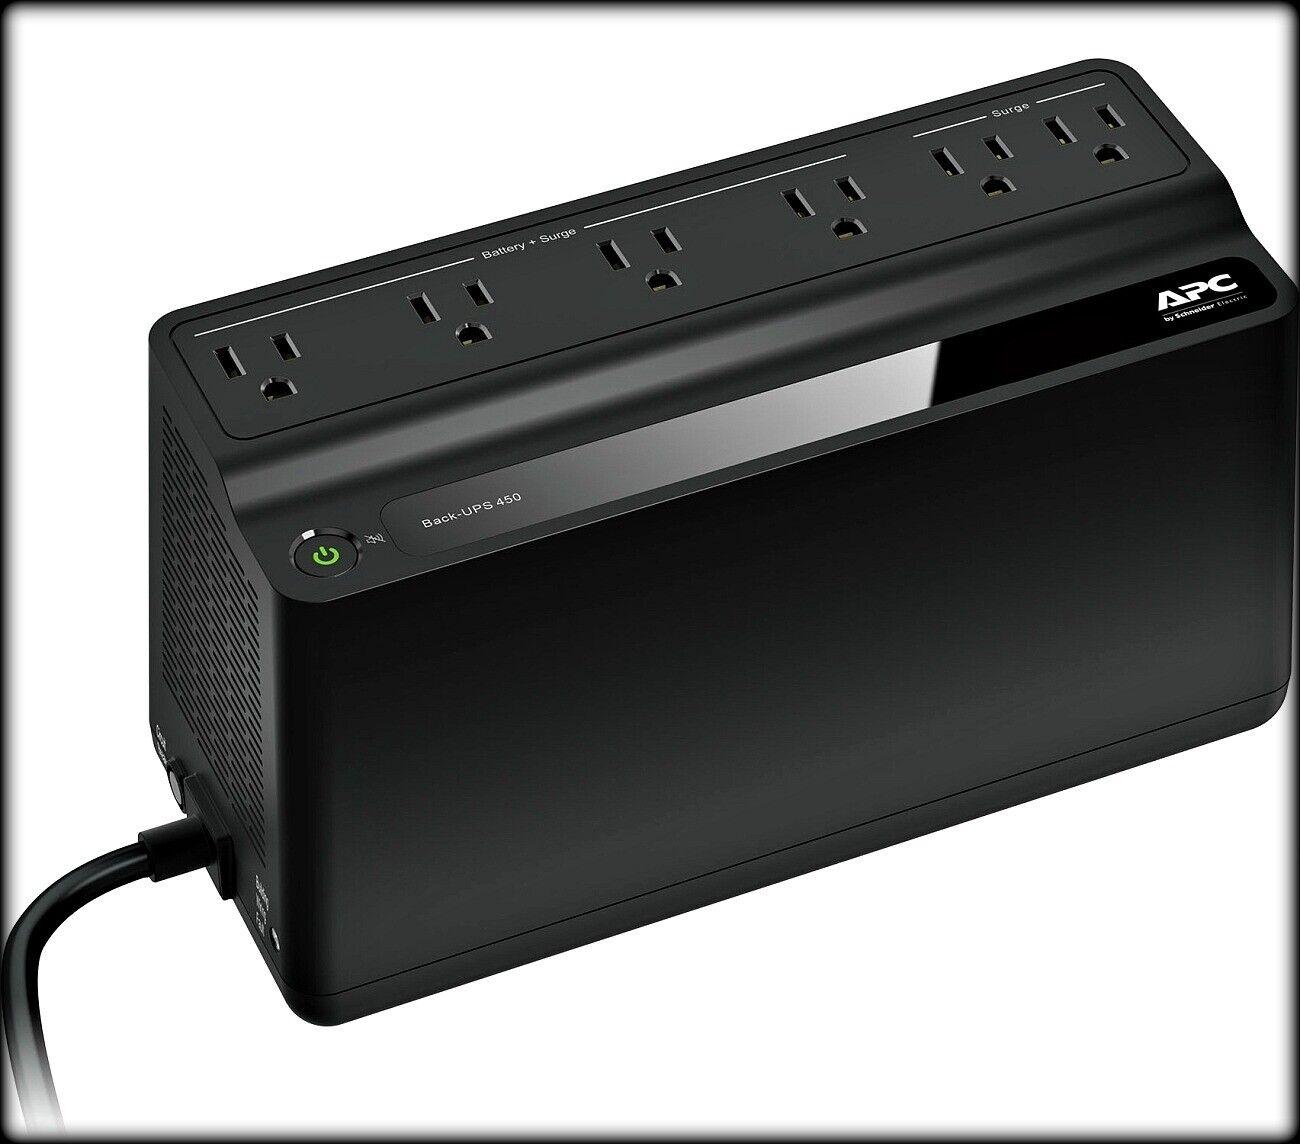 Apc - Back-ups 450va Battery Back-up System - Black